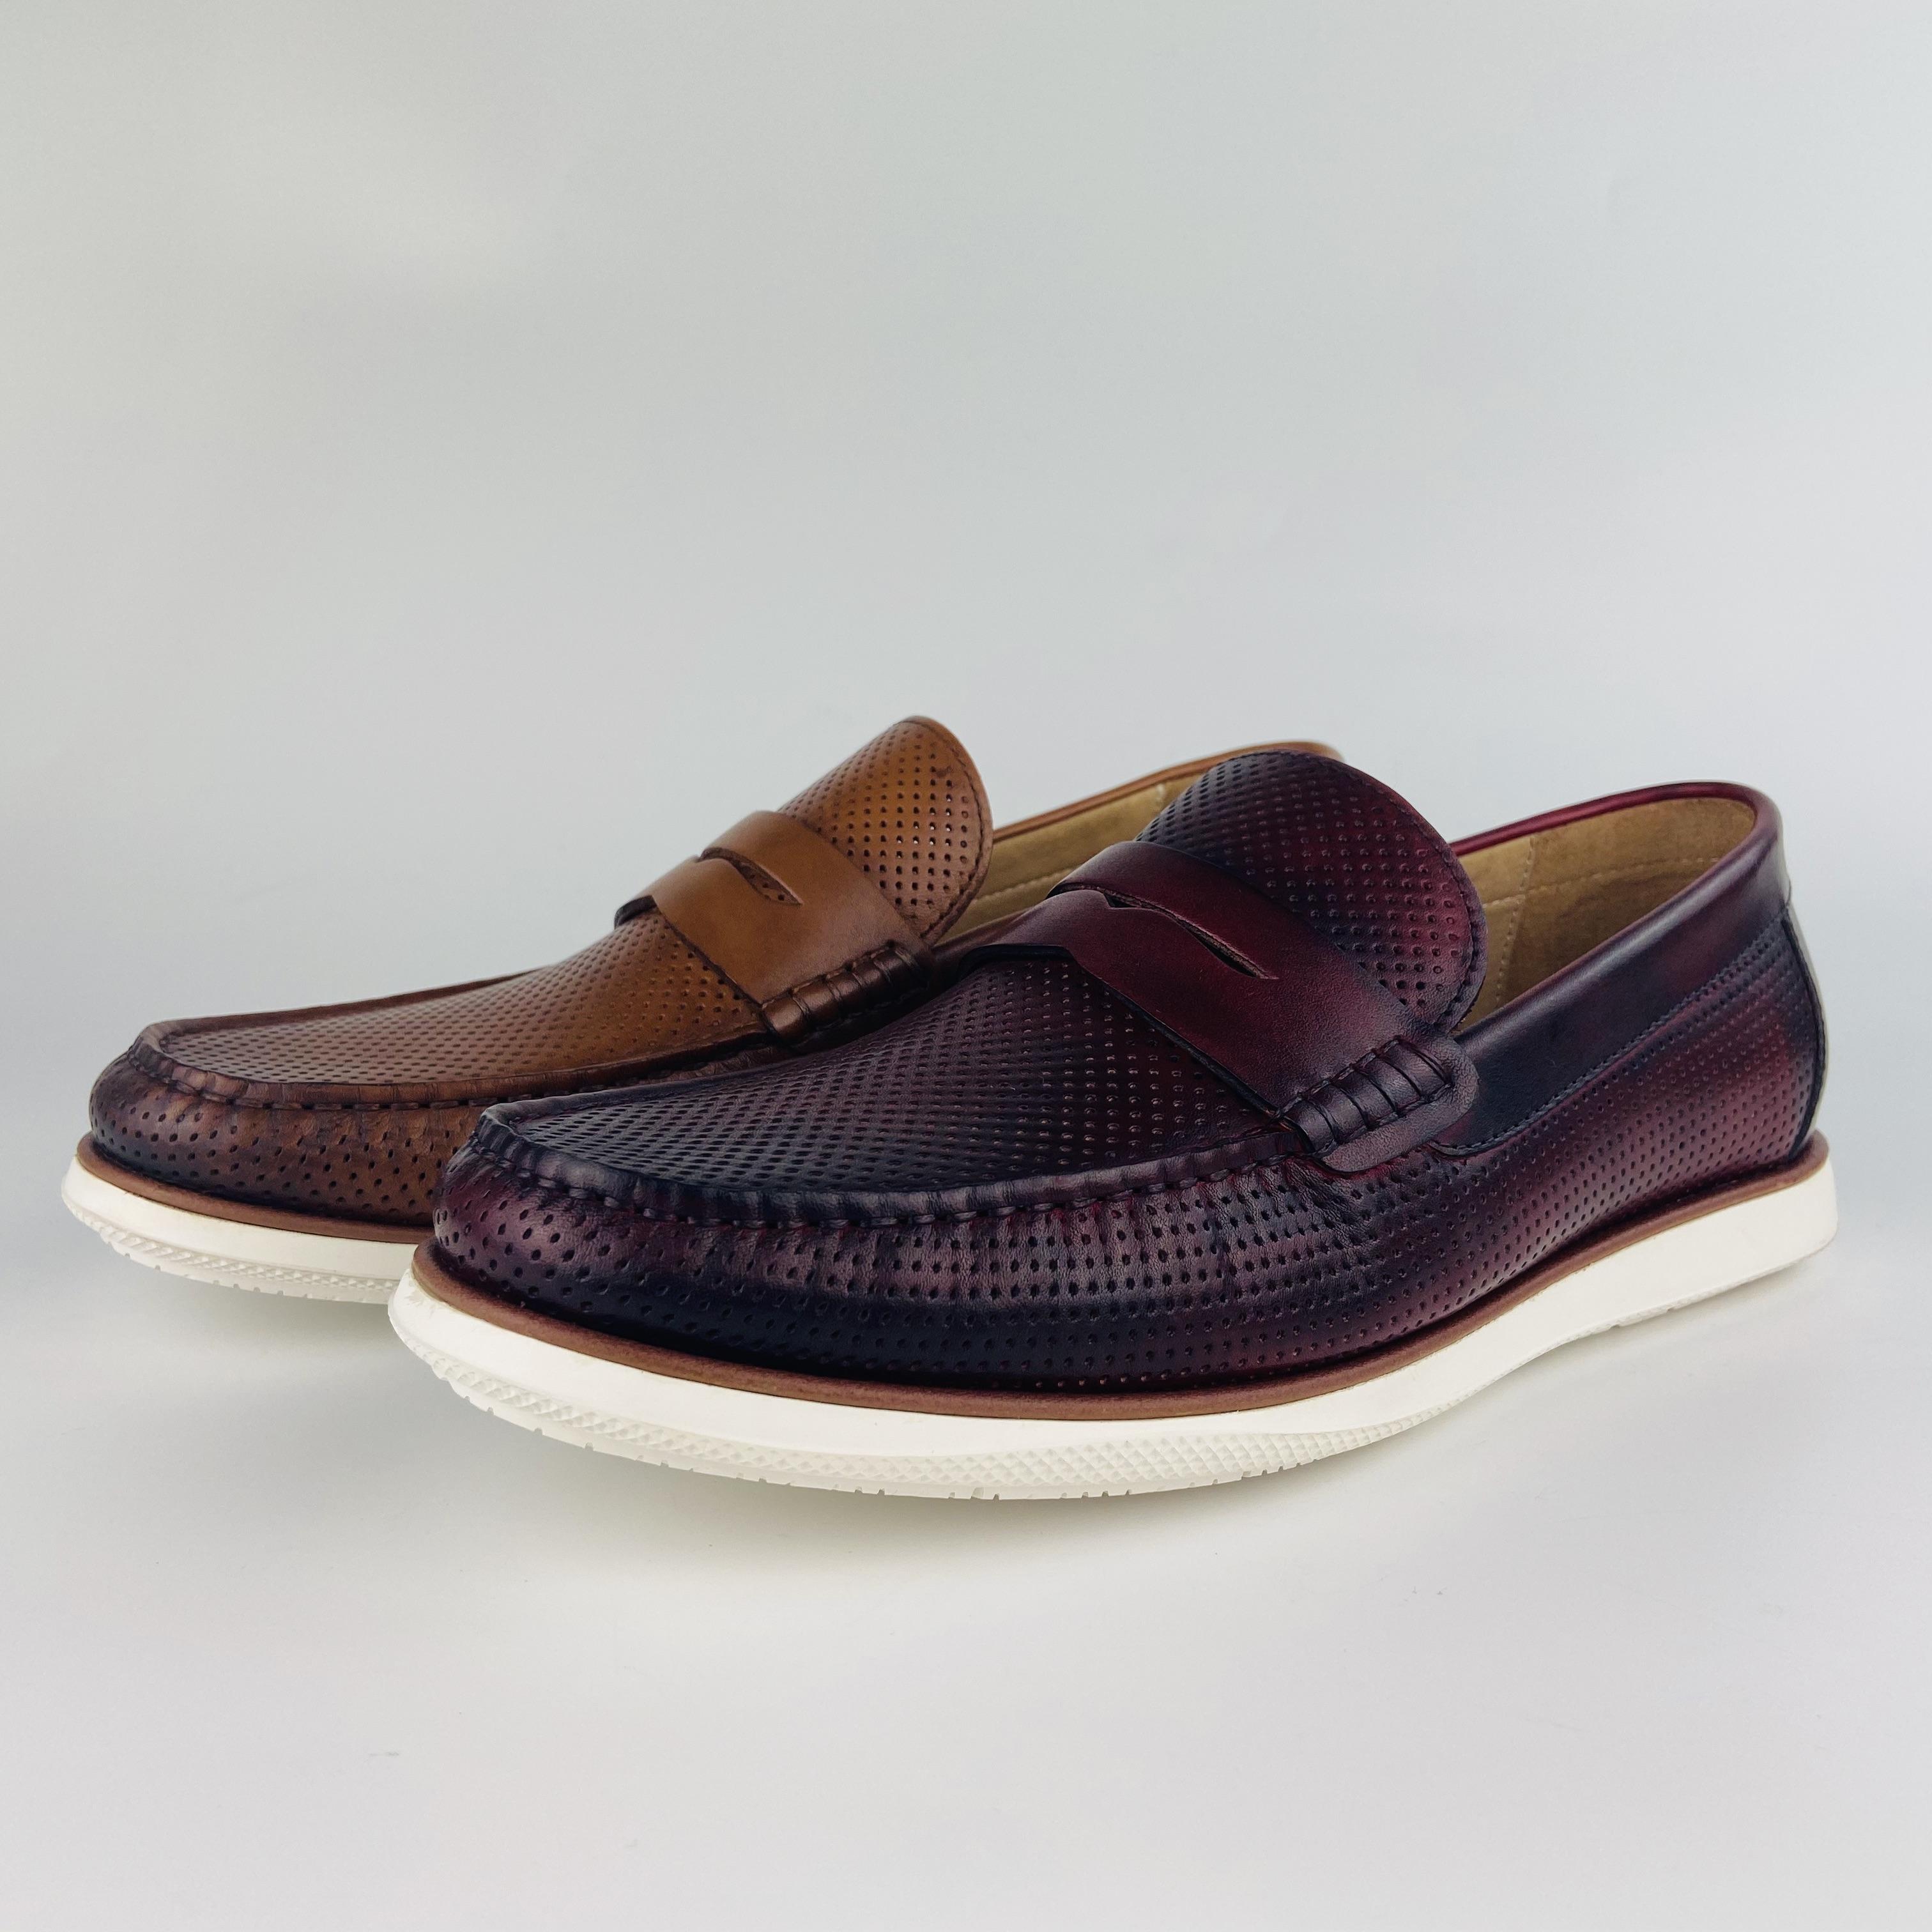 European trendy original leather men casual flat leather shoes